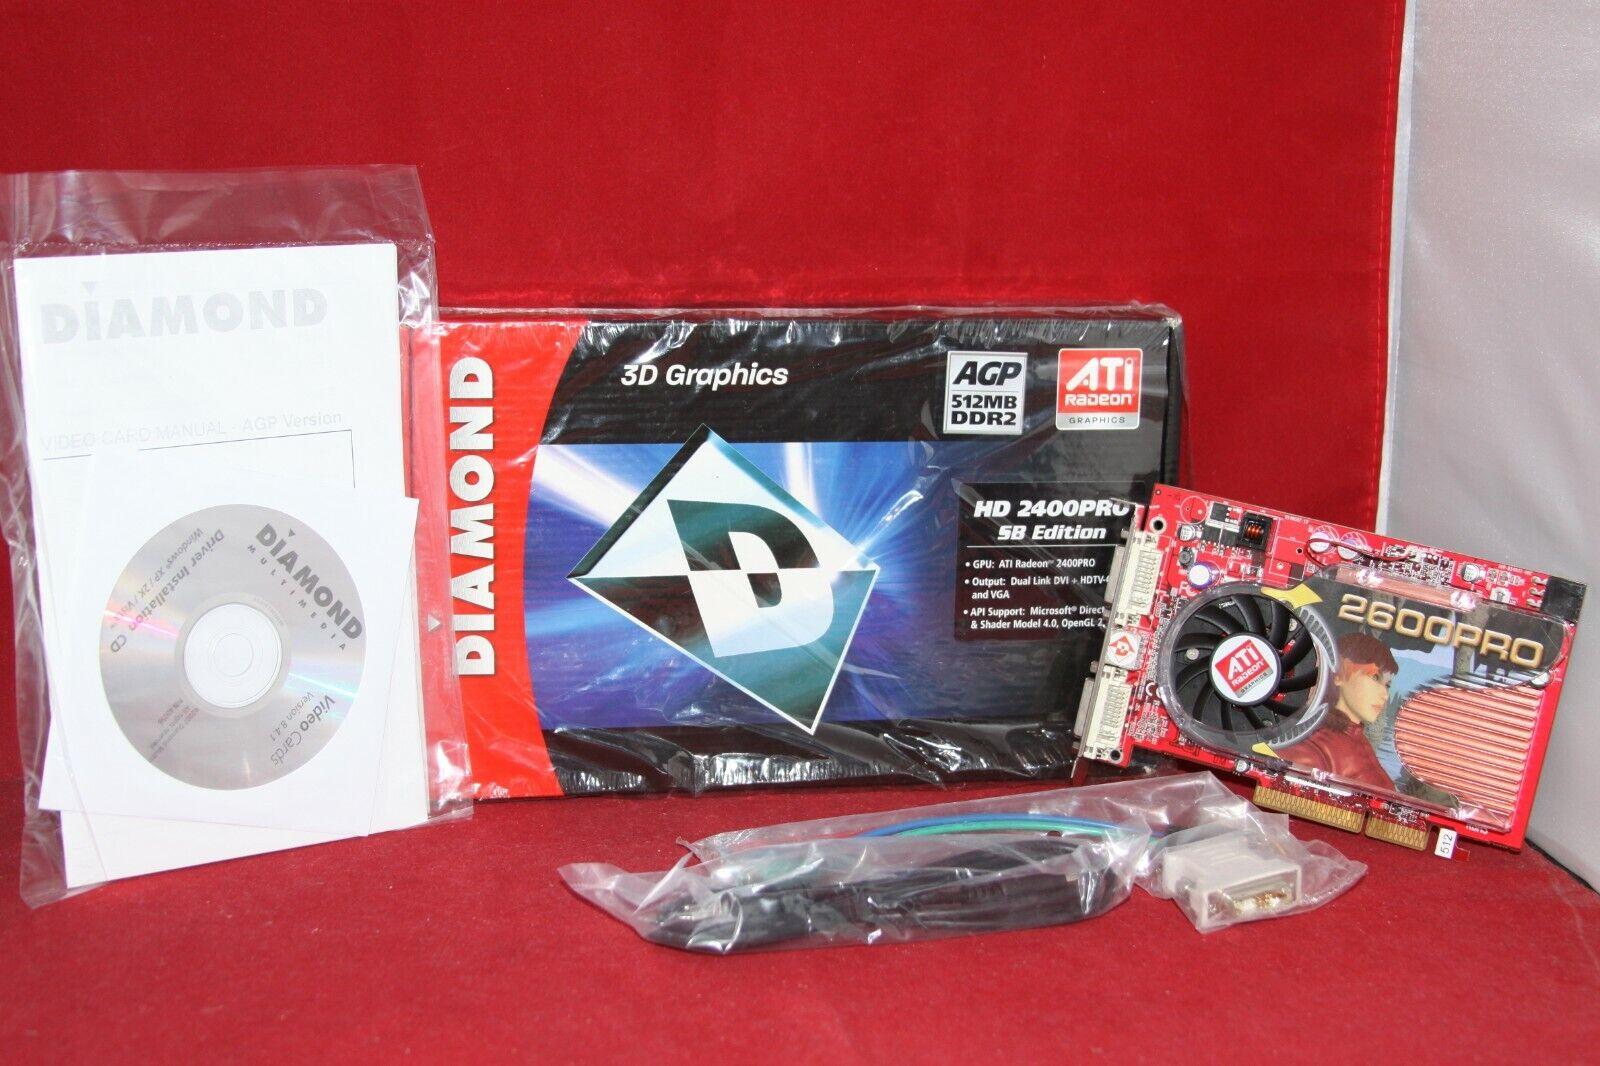 Diamond ATI Radeon 2400PRO 512MB 64-BIT GDDR2, AGP Graphics Card (2400PRO512ASB)